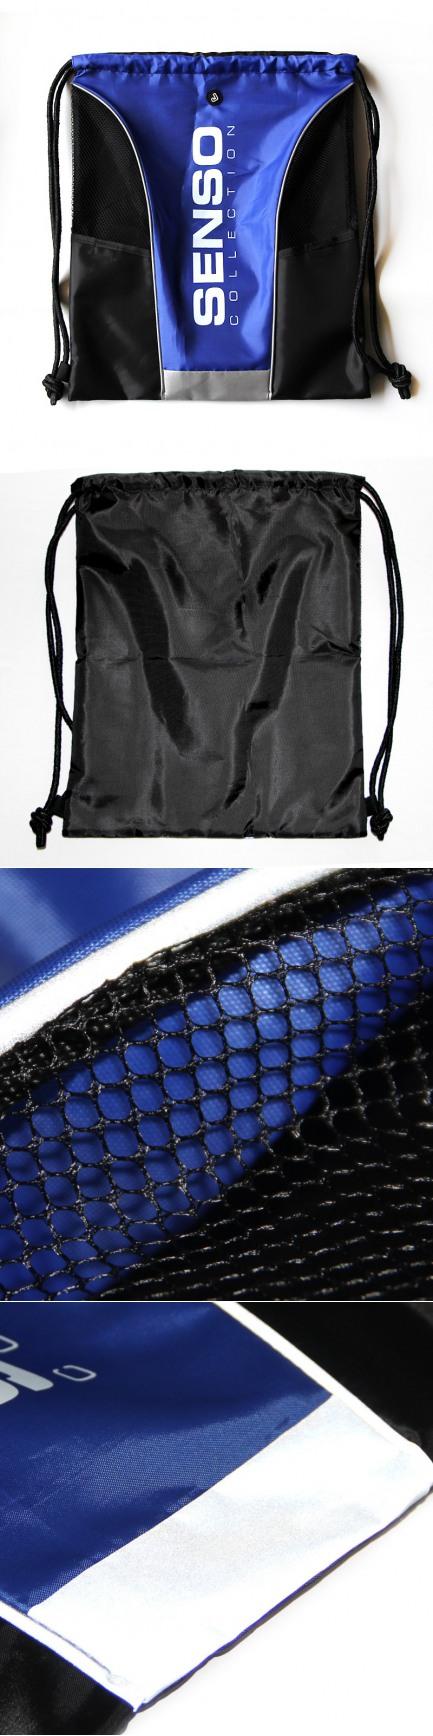 Gym Drawstring Bags.